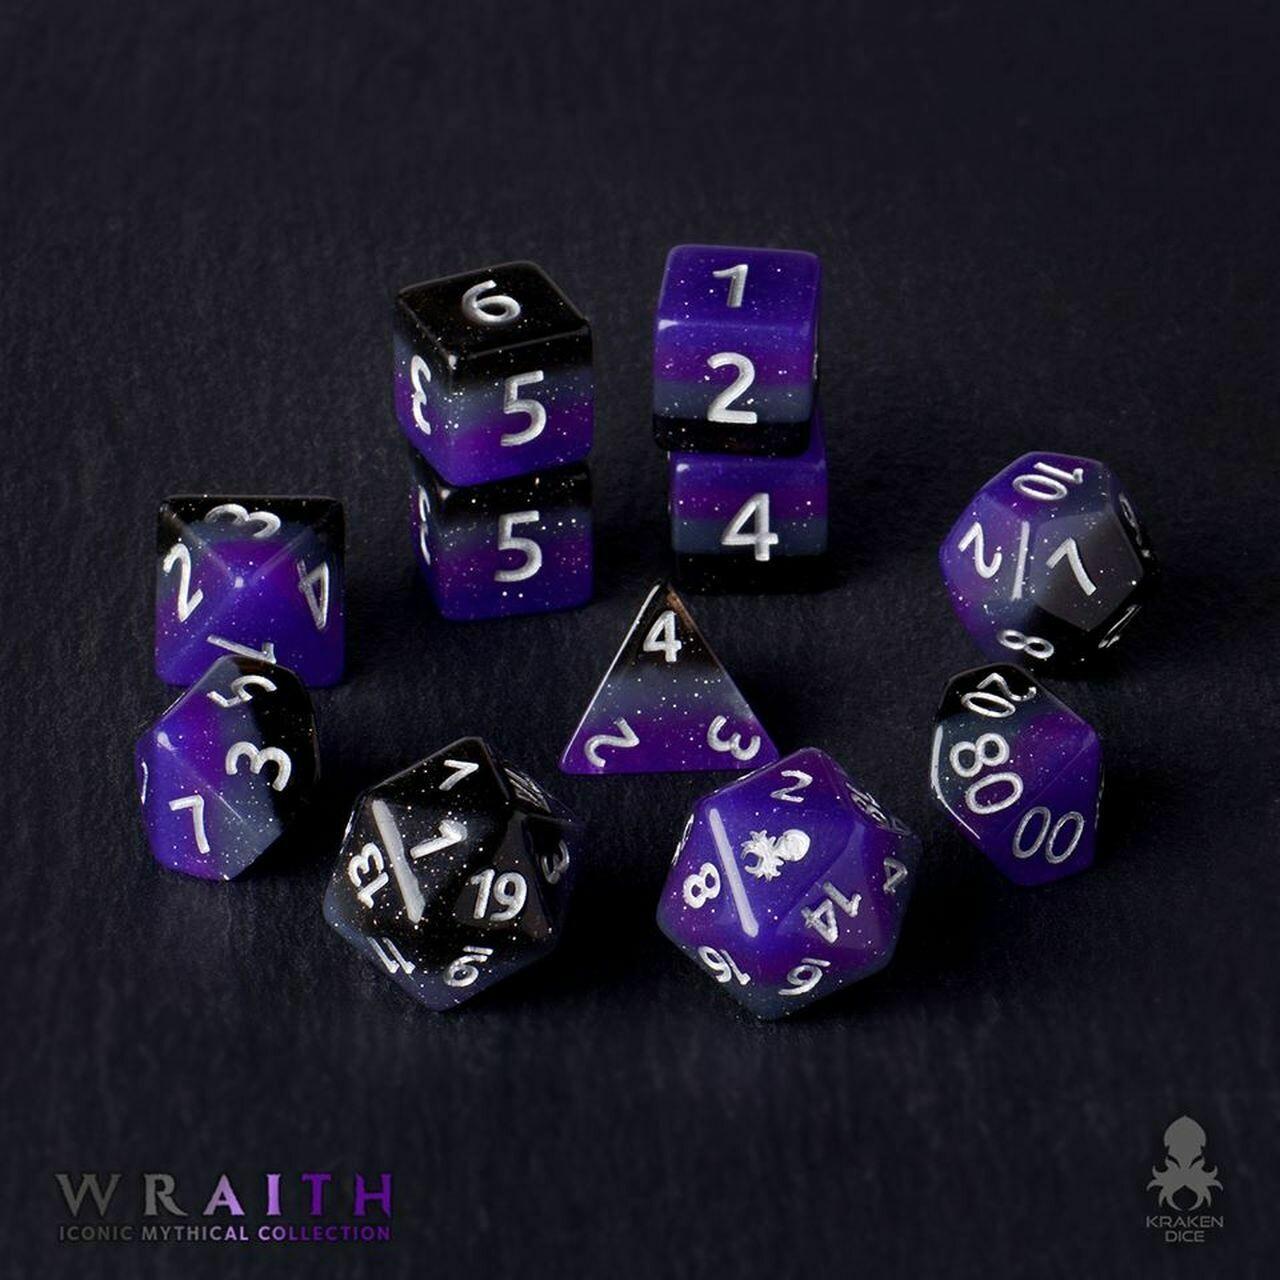 Wraith 12pc Silver Ink Dice Set With Kraken Logo